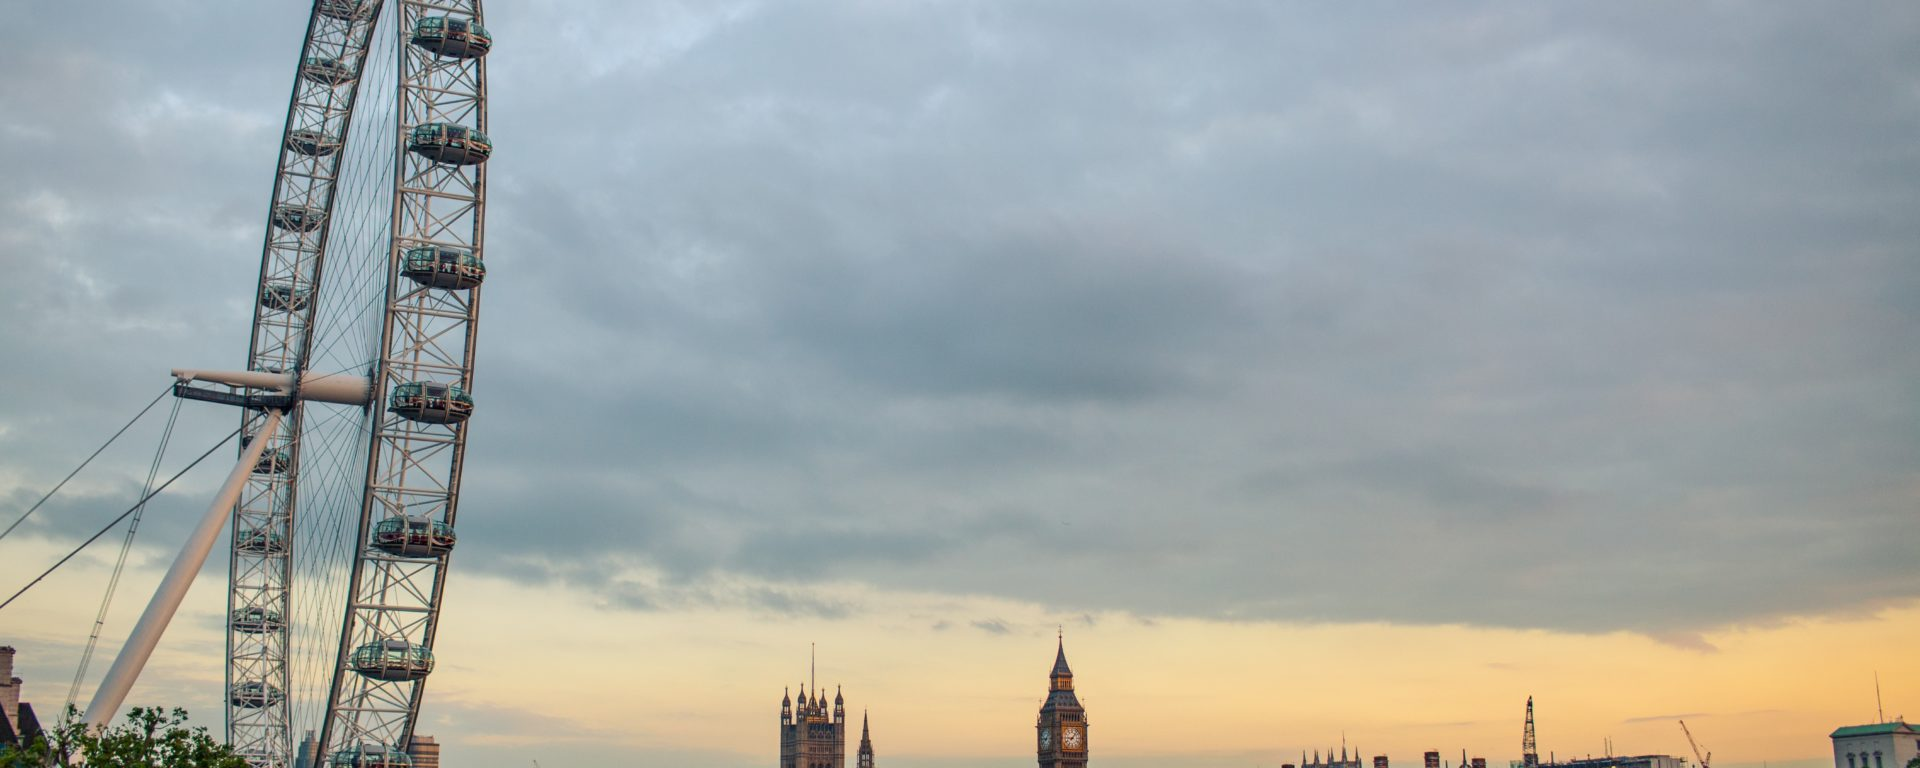 London Eye Big Ben Flugzeug stocksnap